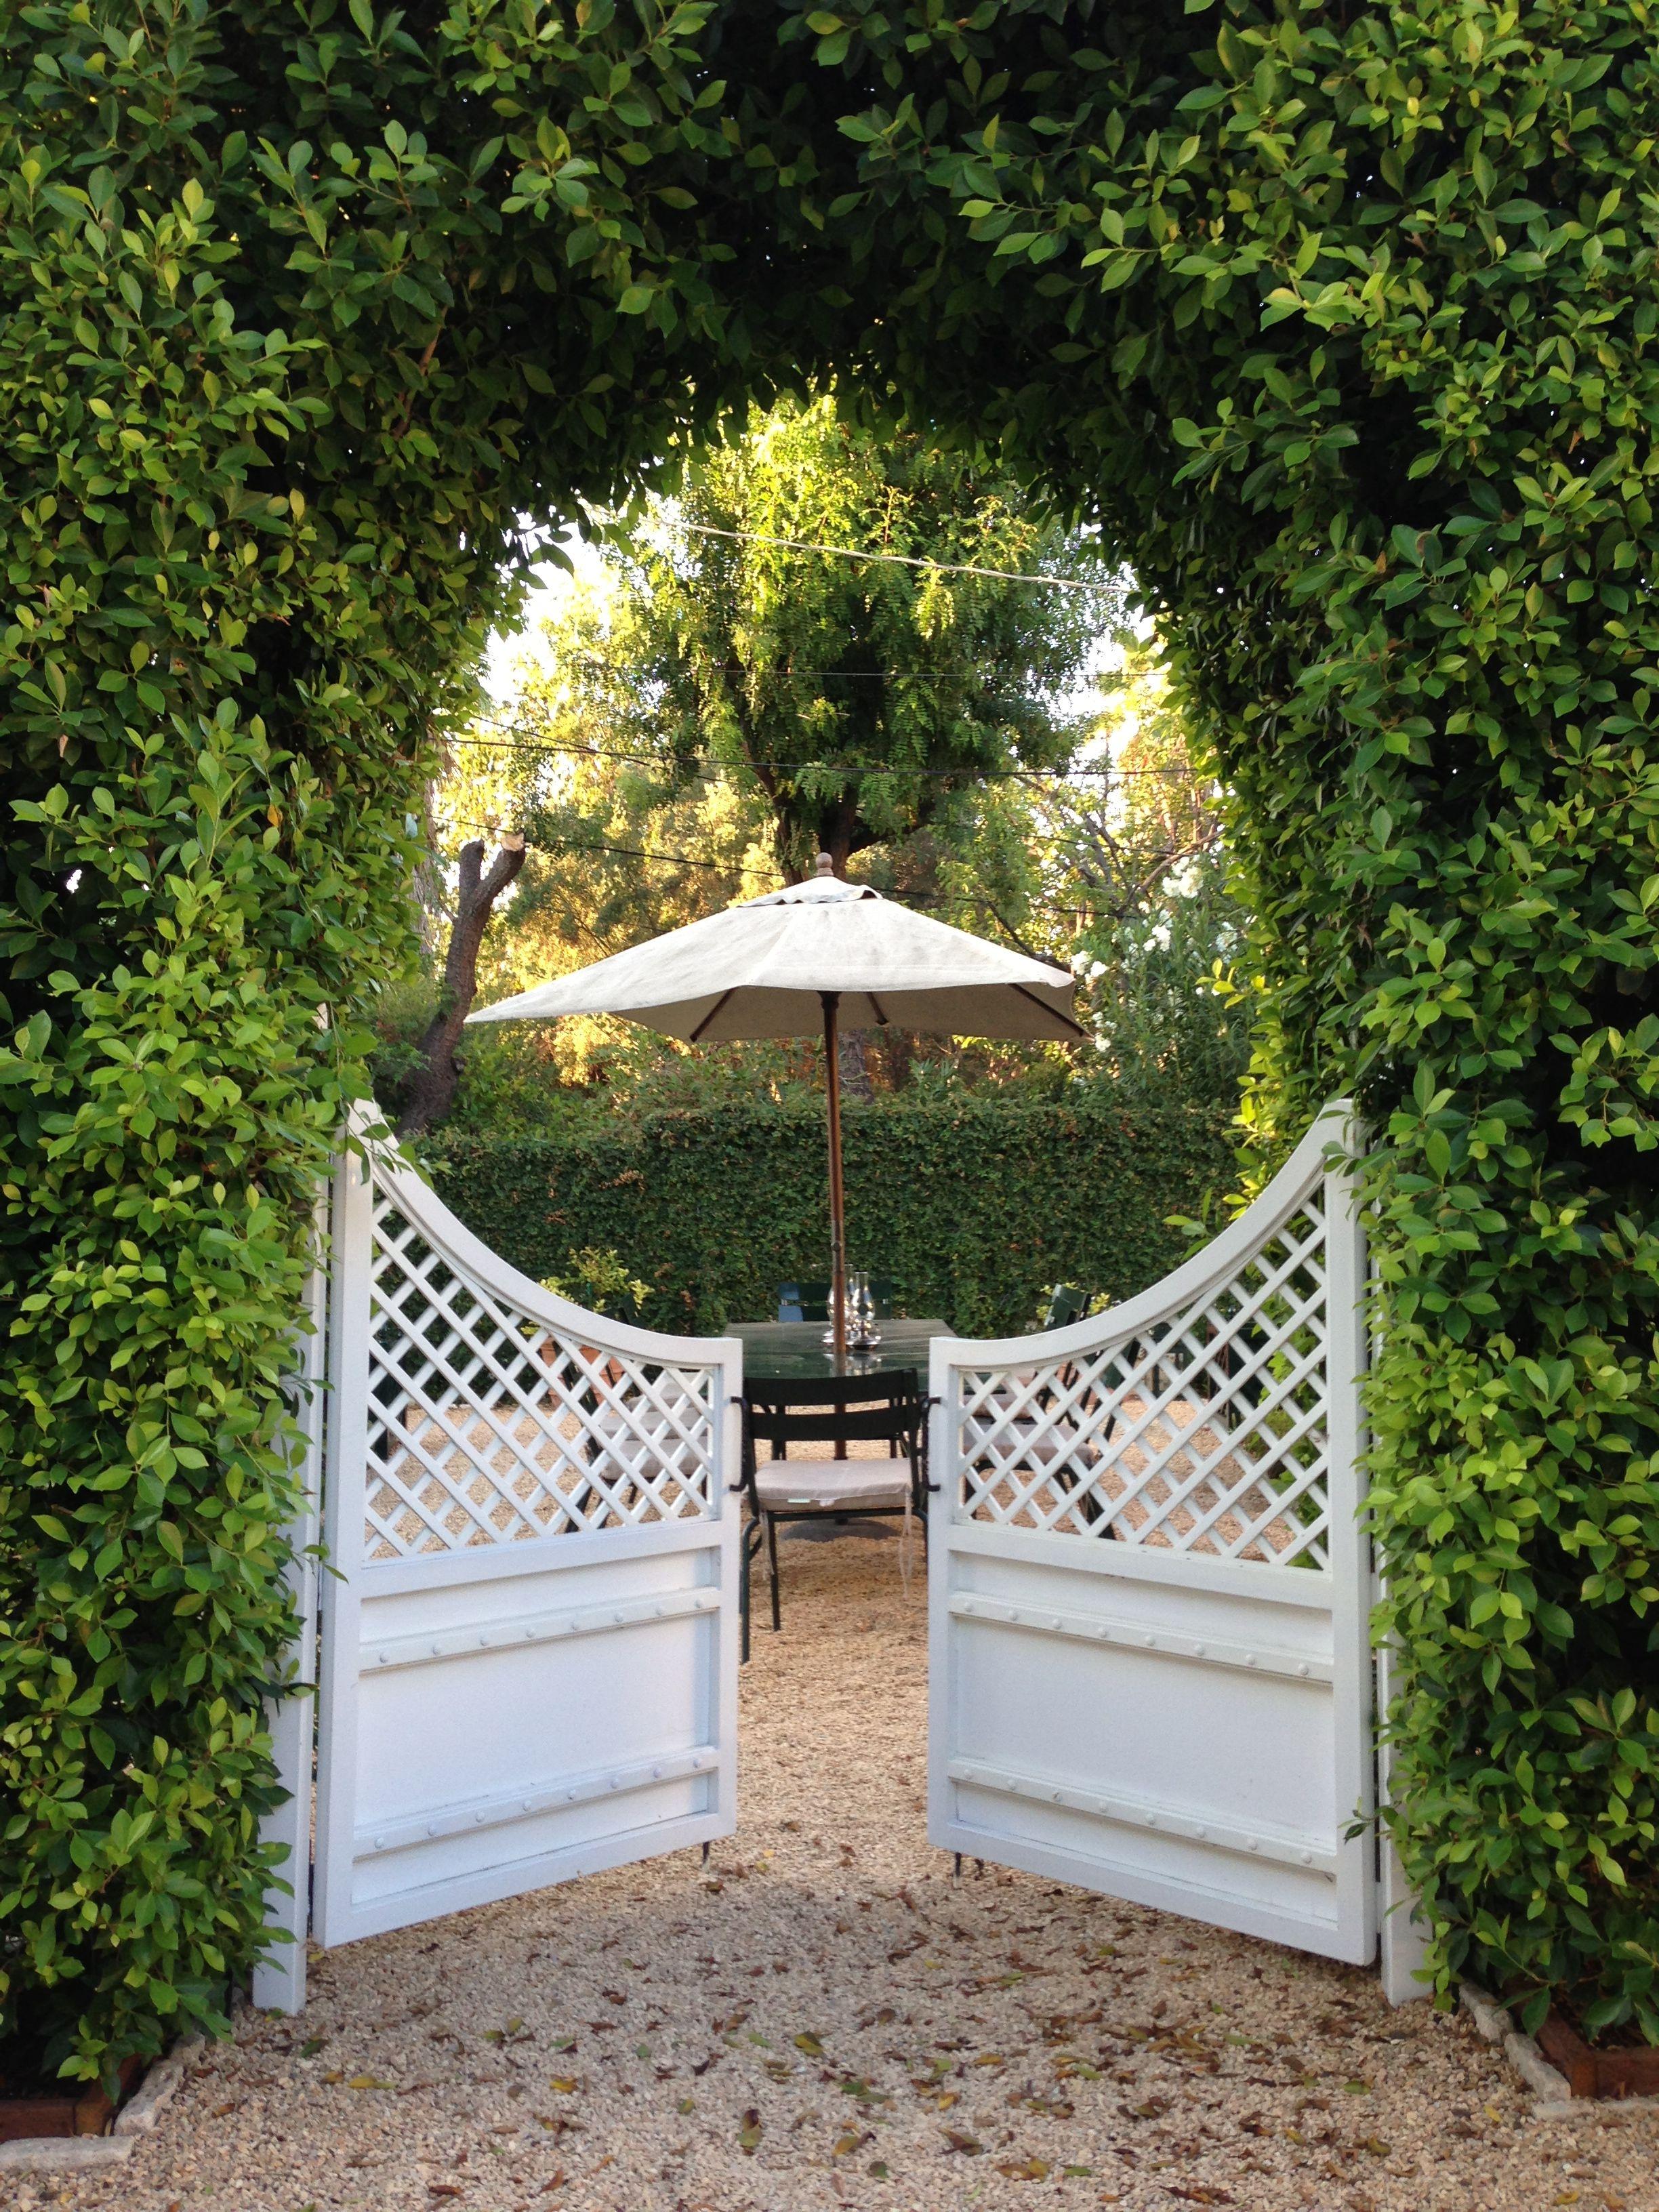 delightful weekend blue red yellow garden pinterest portillon de jardin portillon et. Black Bedroom Furniture Sets. Home Design Ideas